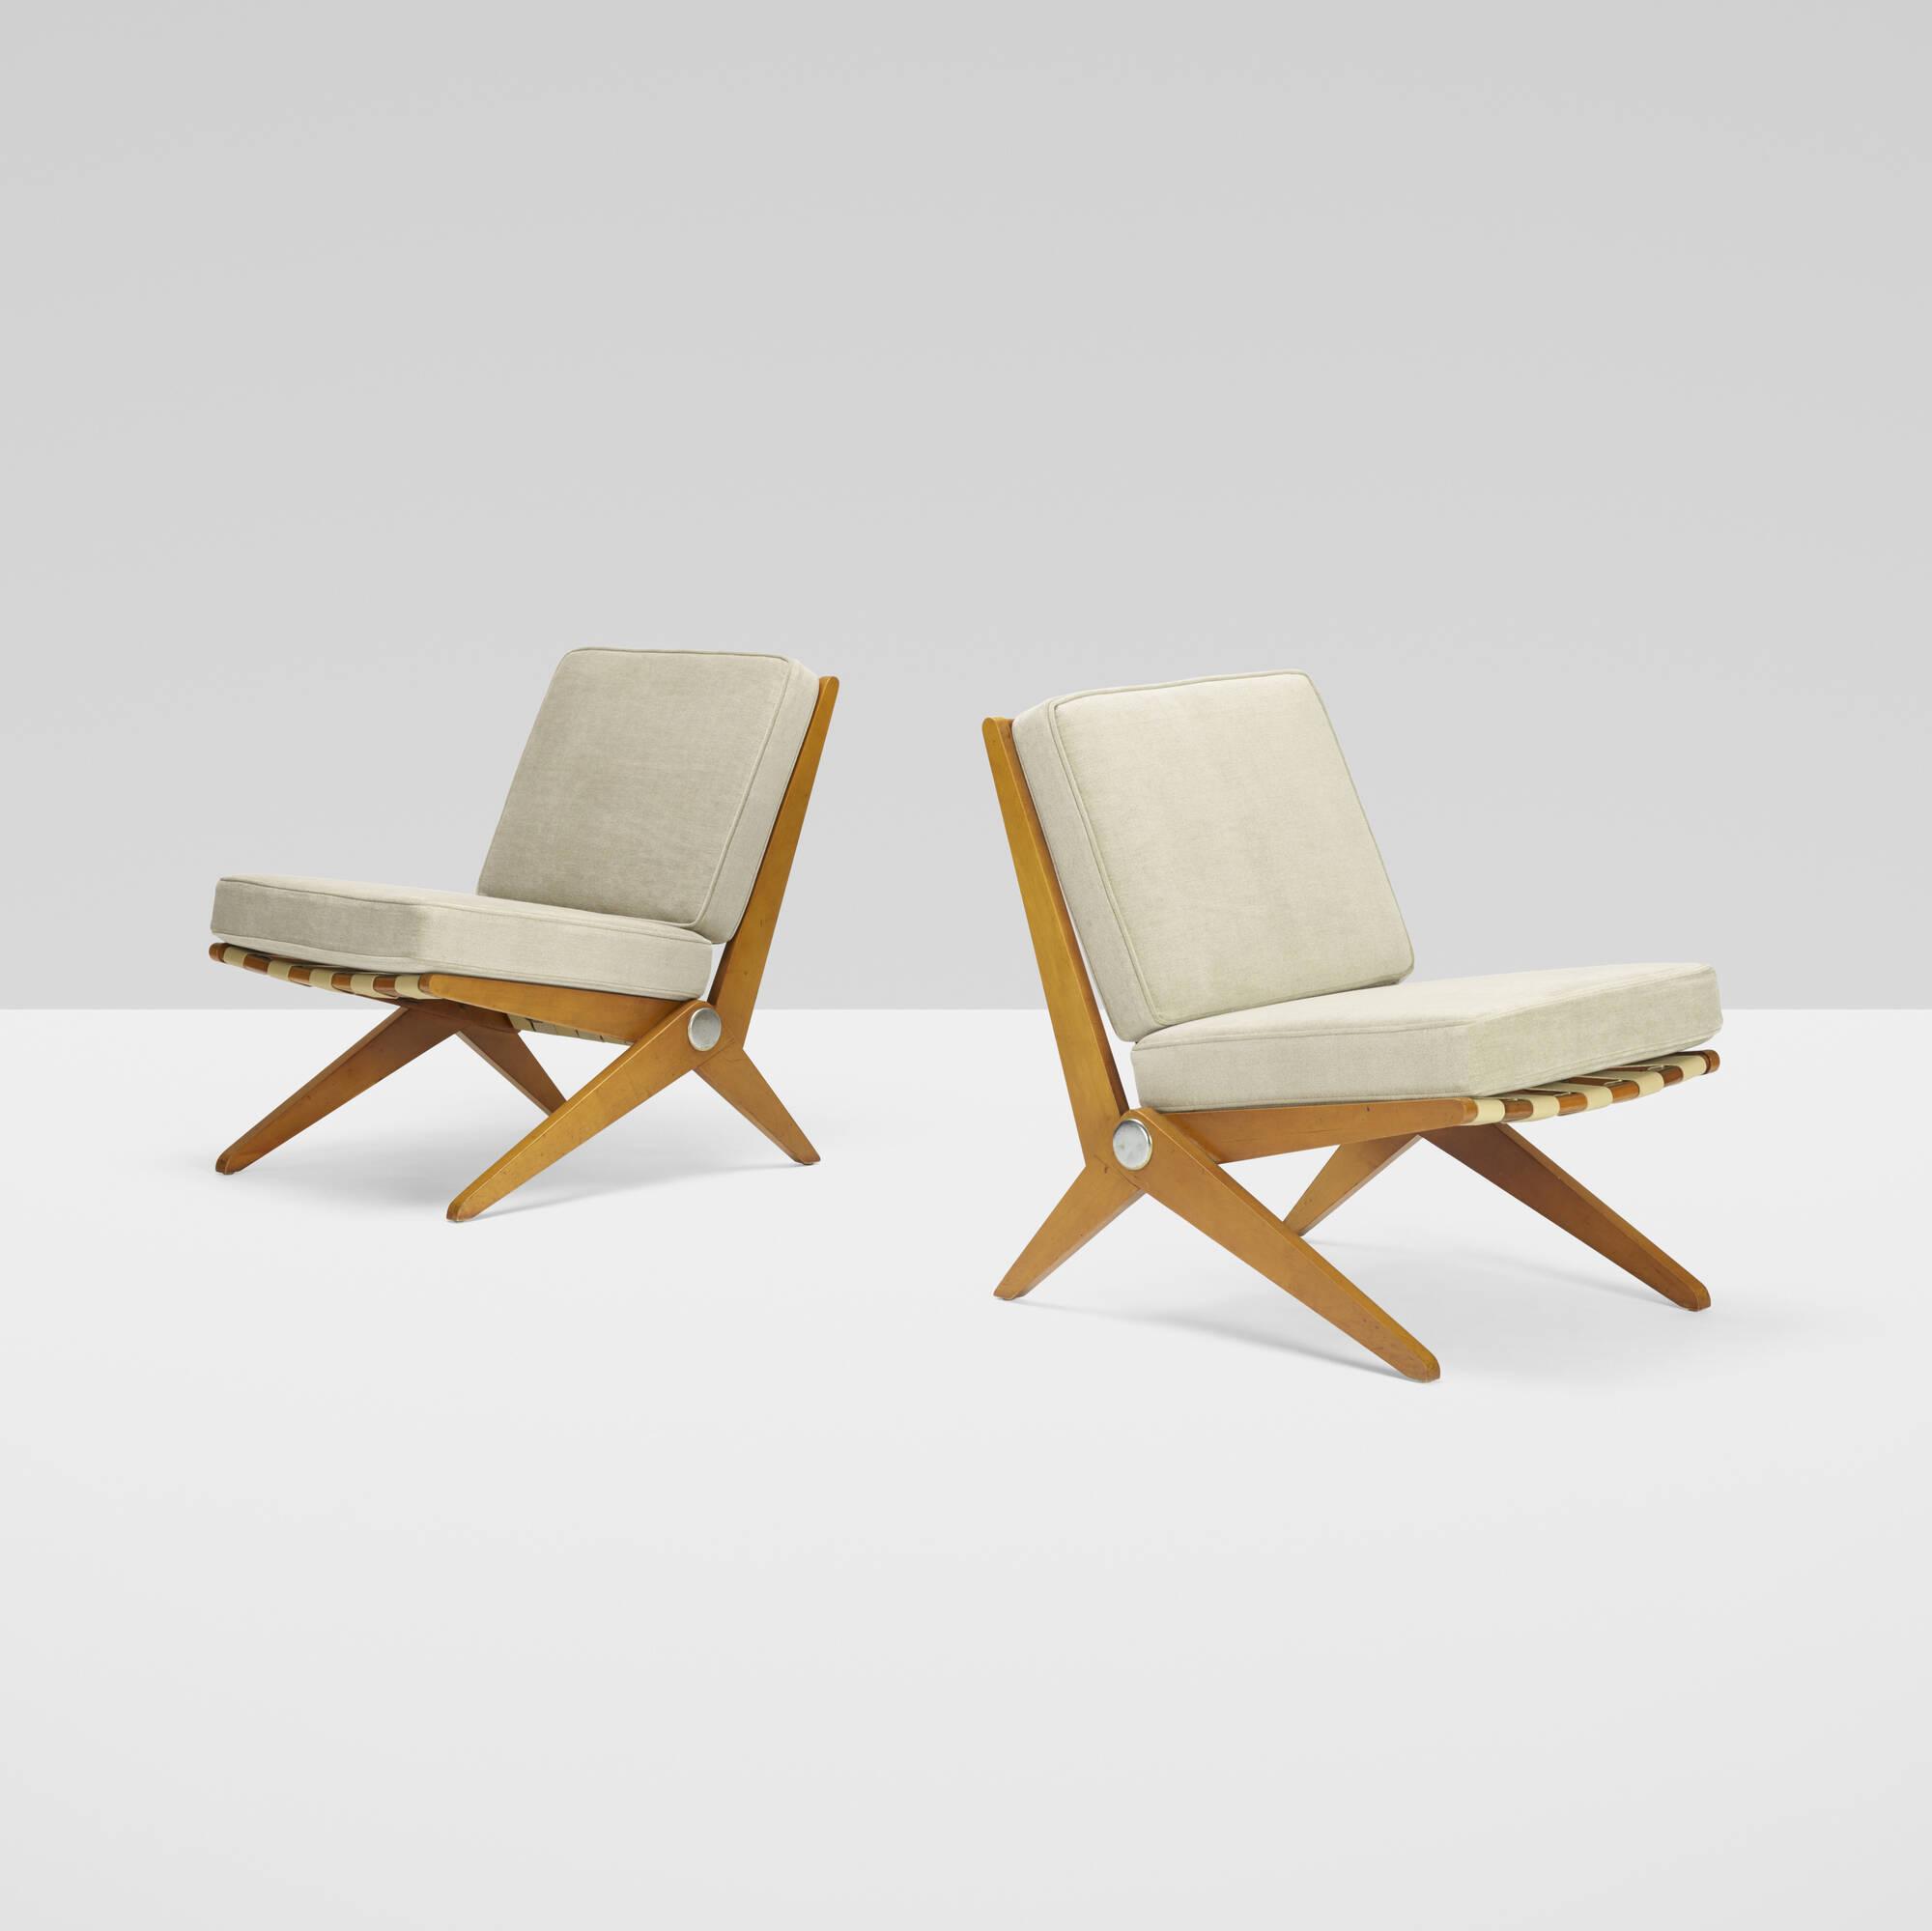 121: Pierre Jeanneret / Scissor chairs, pair (2 of 2)